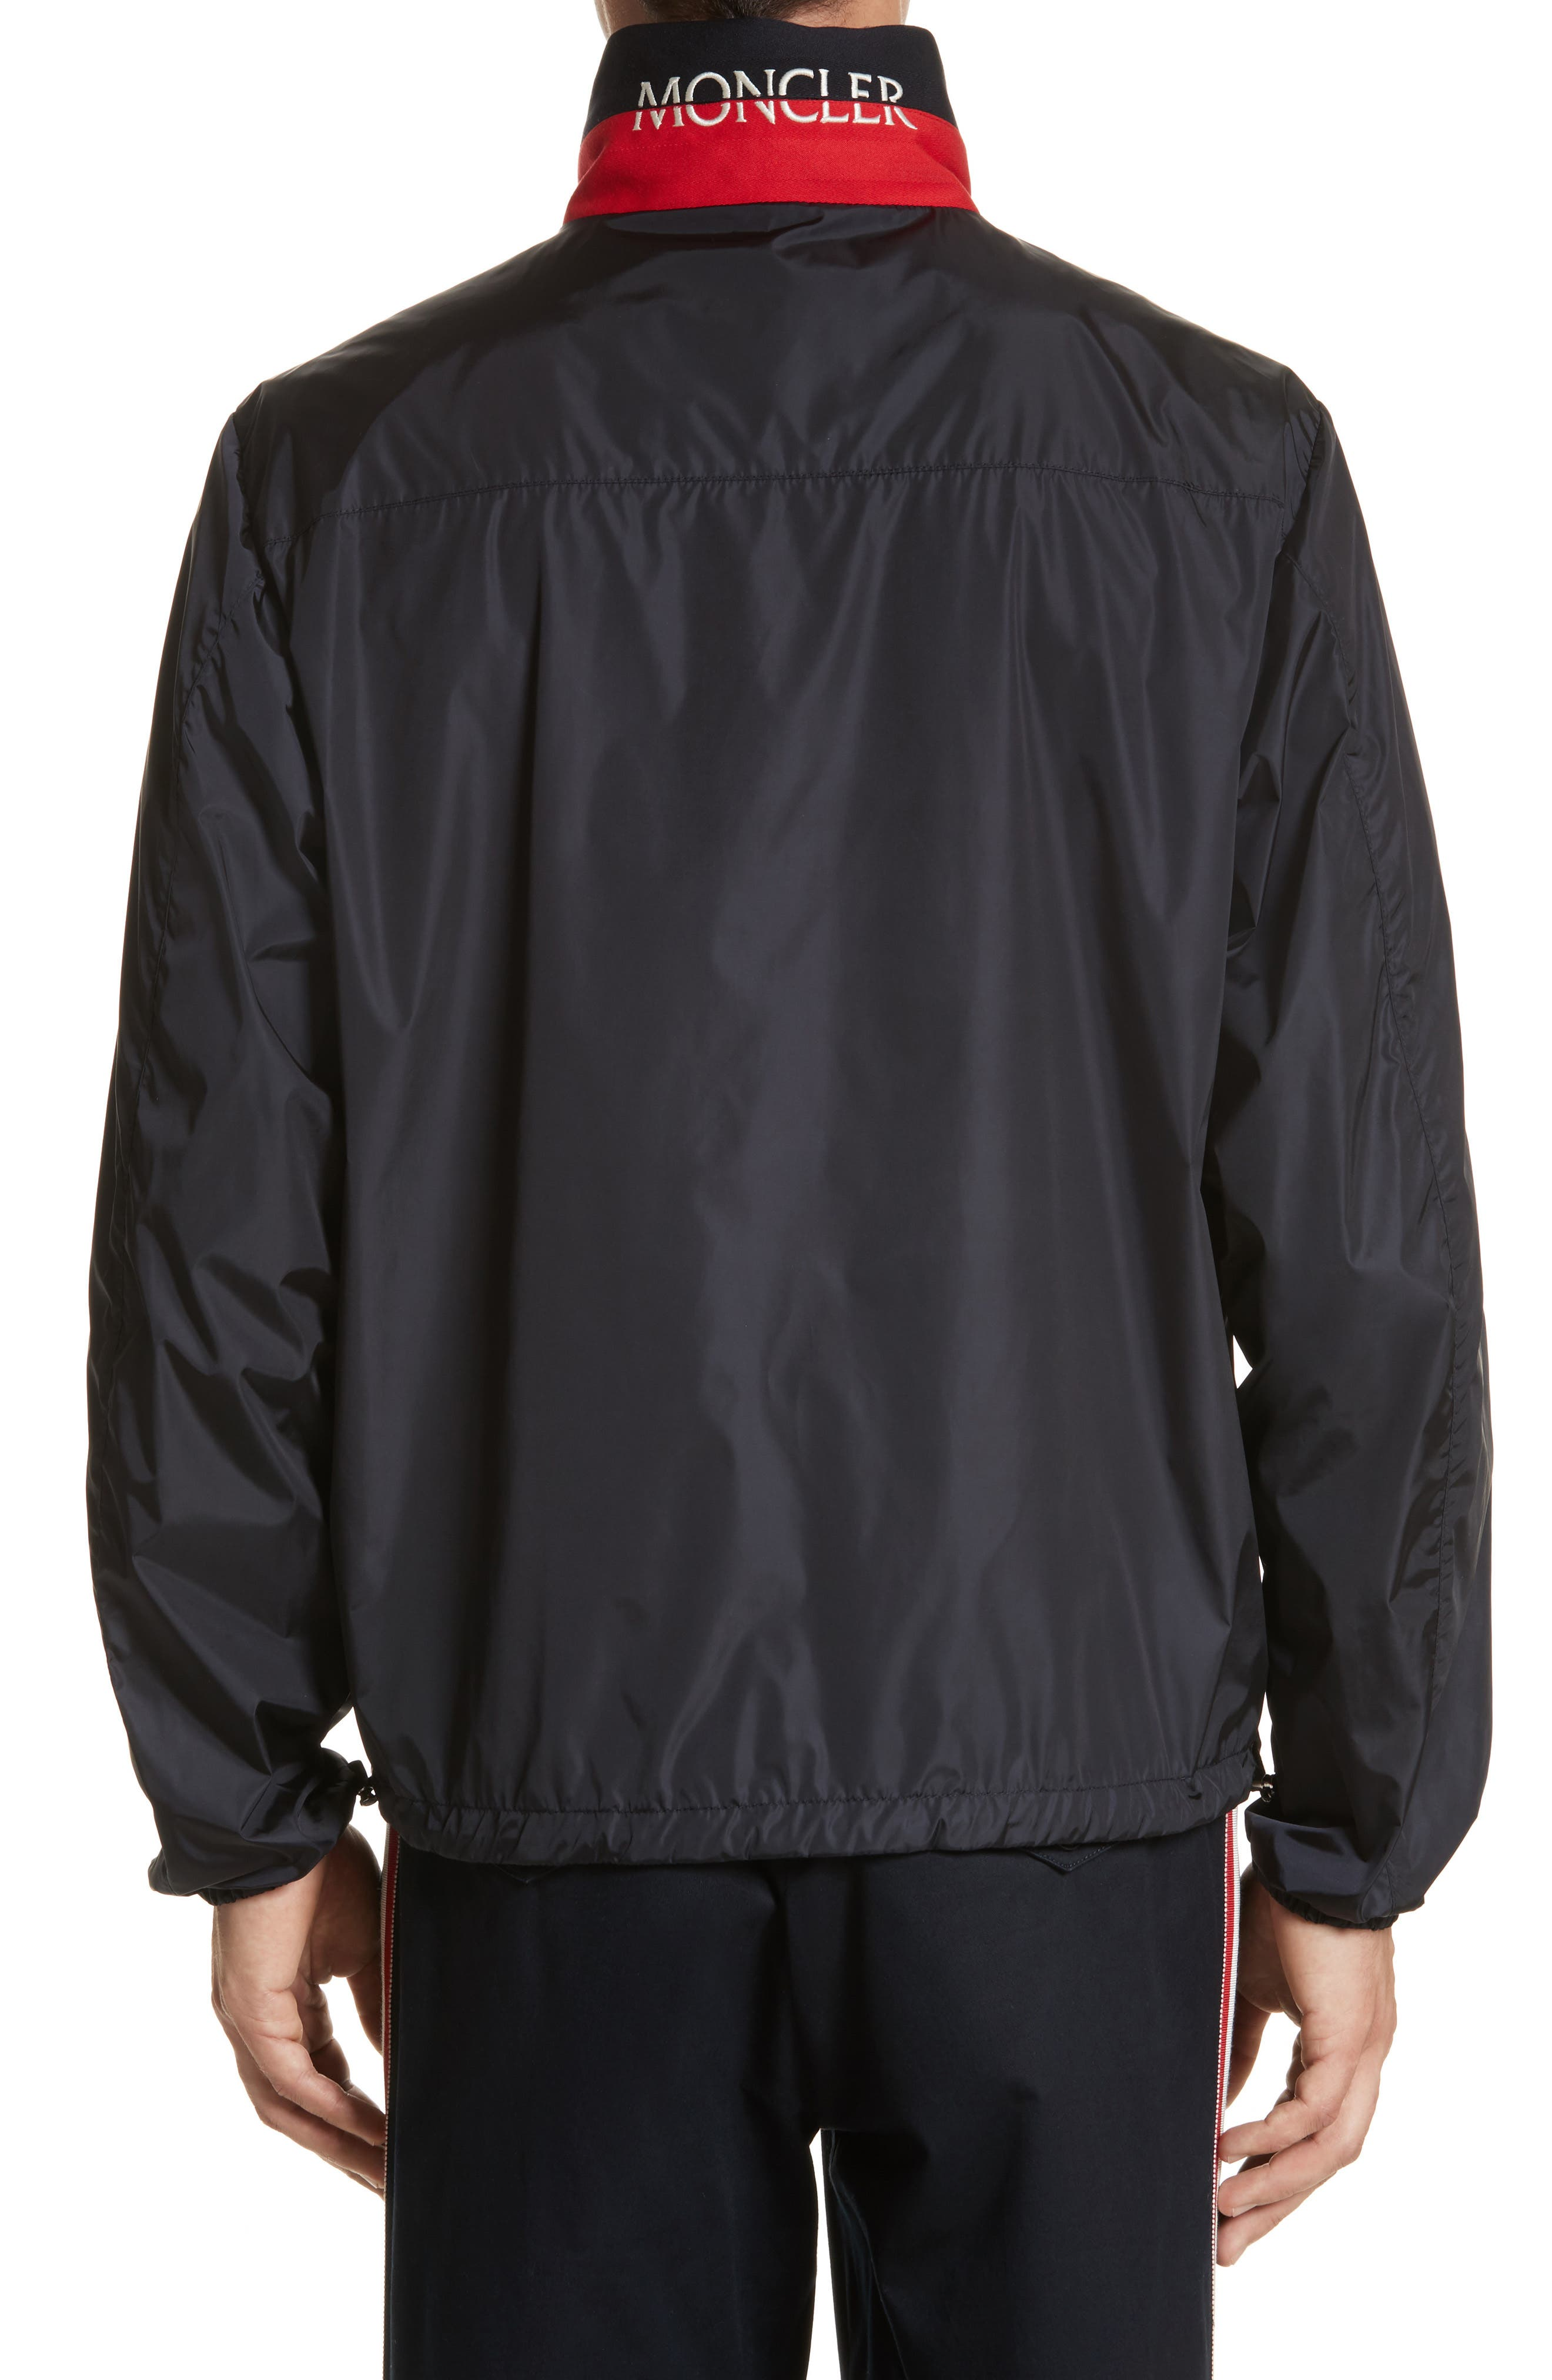 Goulier Nylon Jacket,                             Alternate thumbnail 2, color,                             NAVY